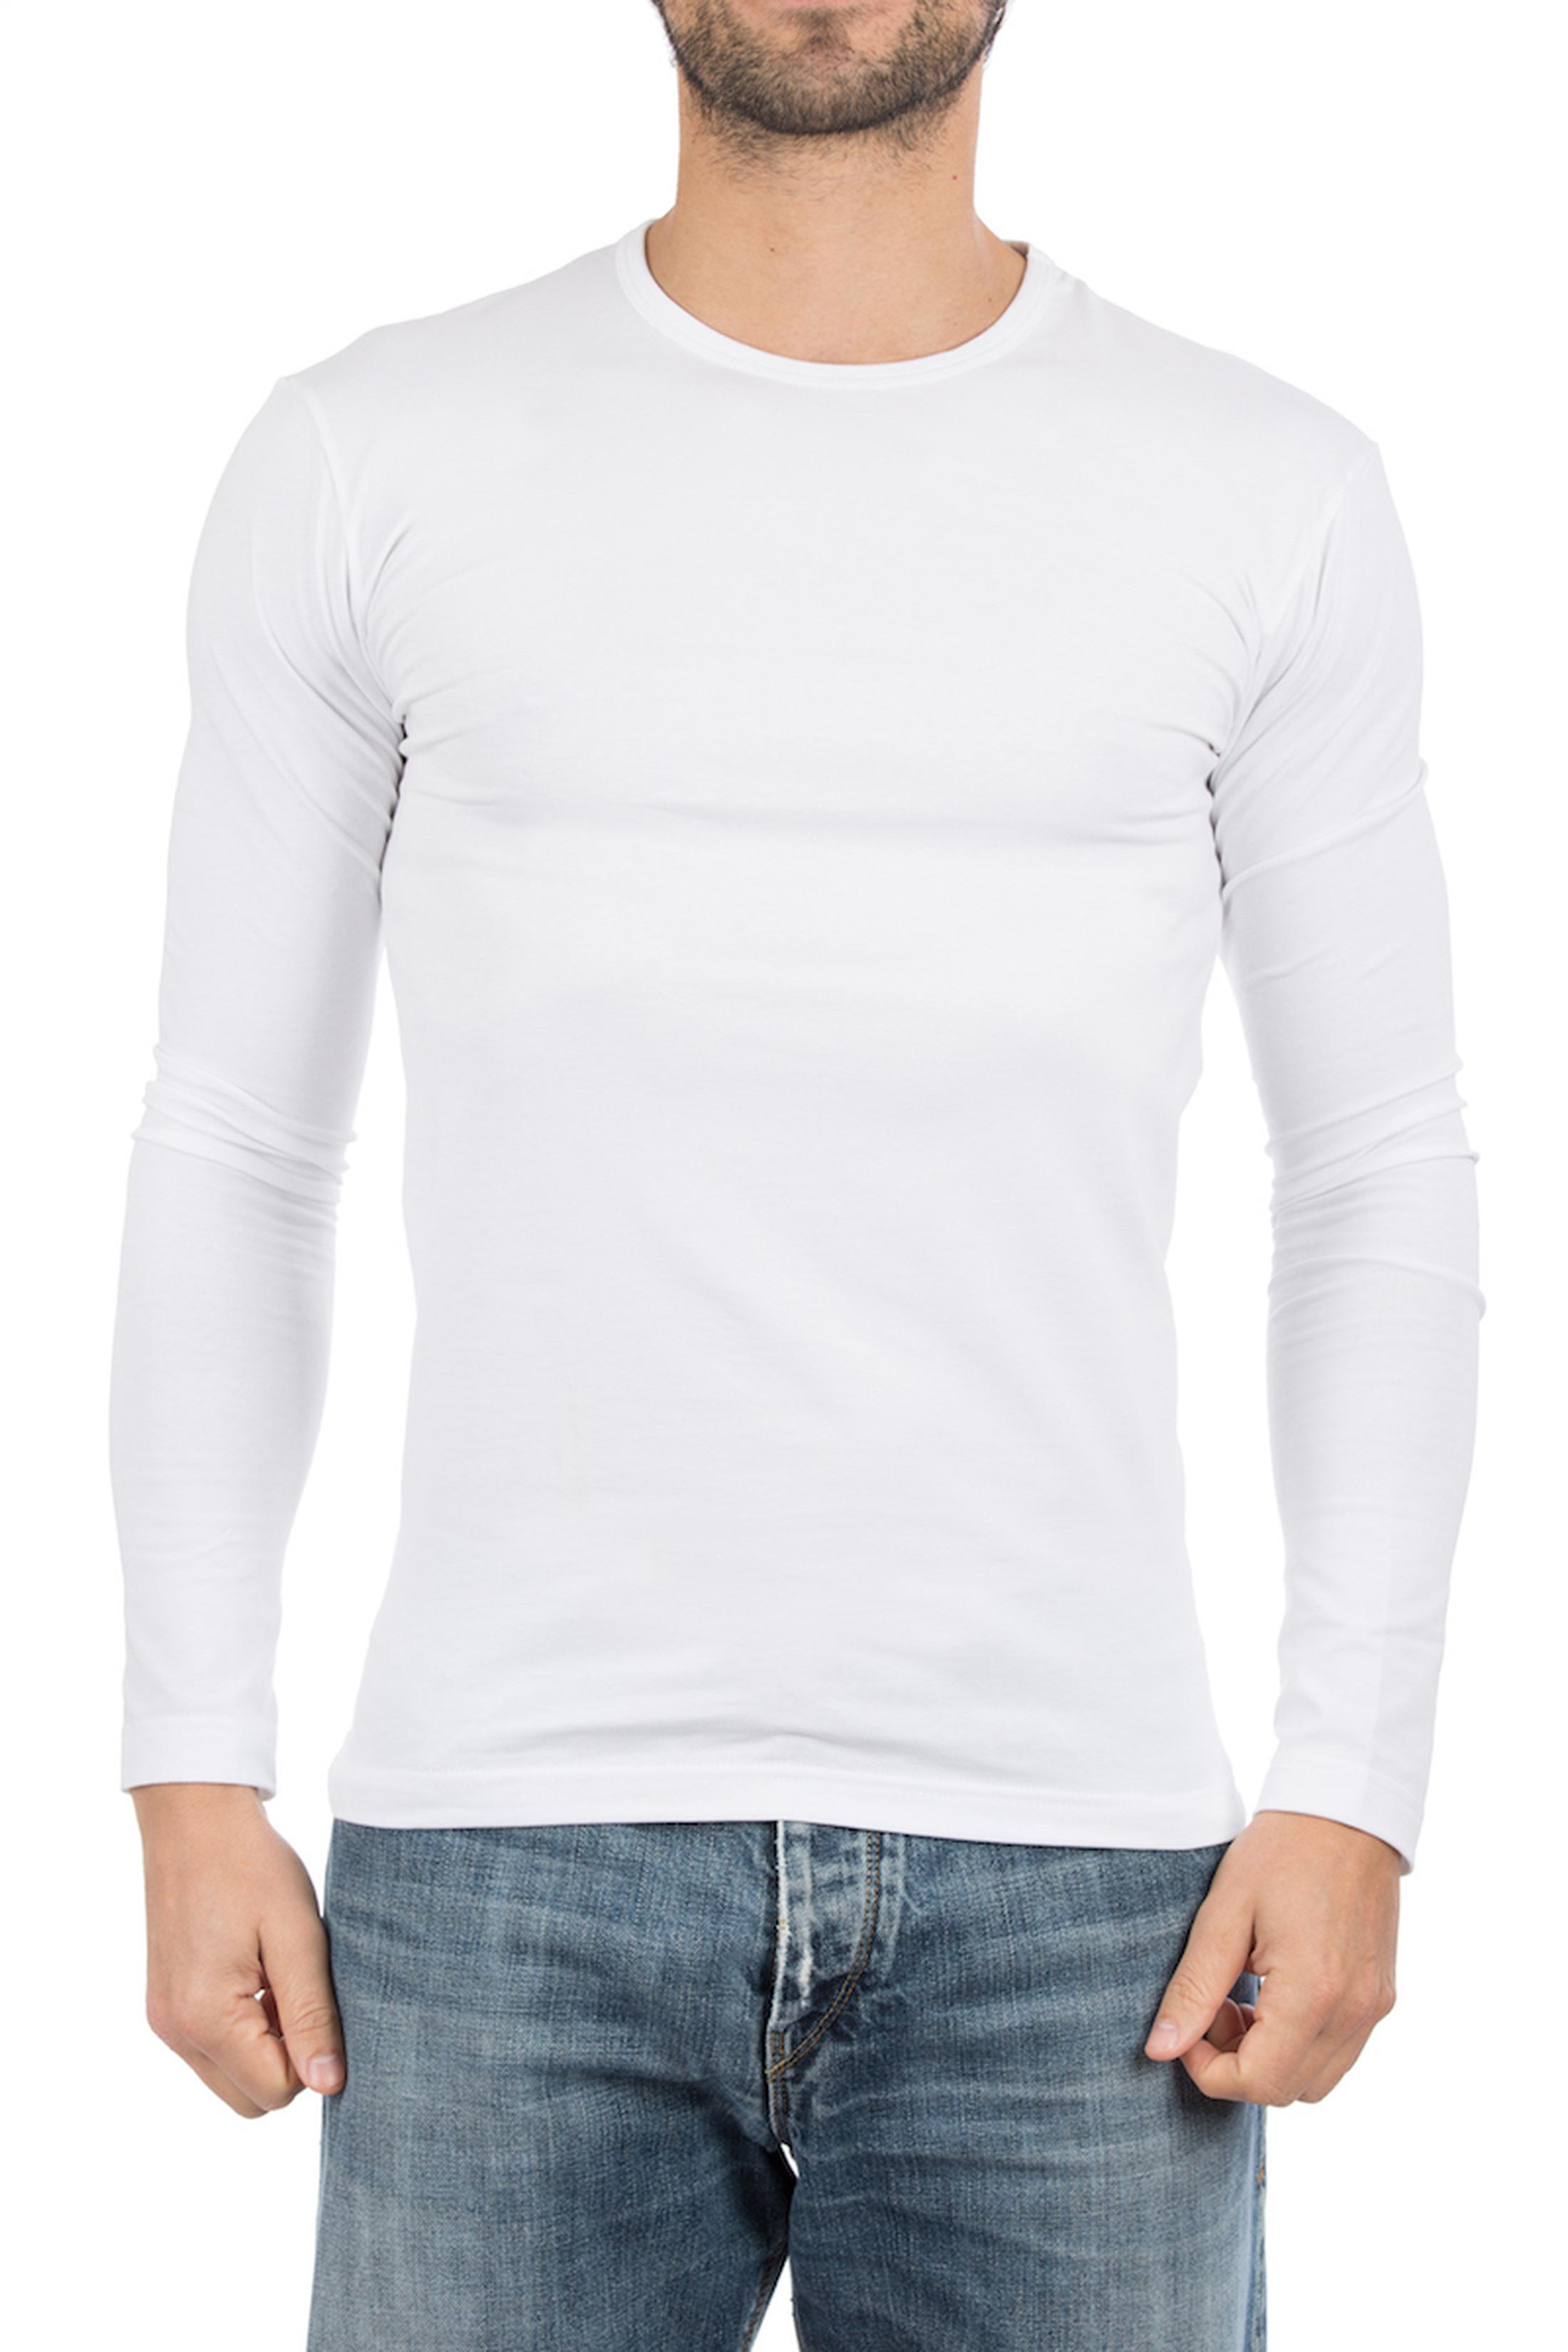 Alan Red Olbia Longsleeve T-shirt Navy foto 3